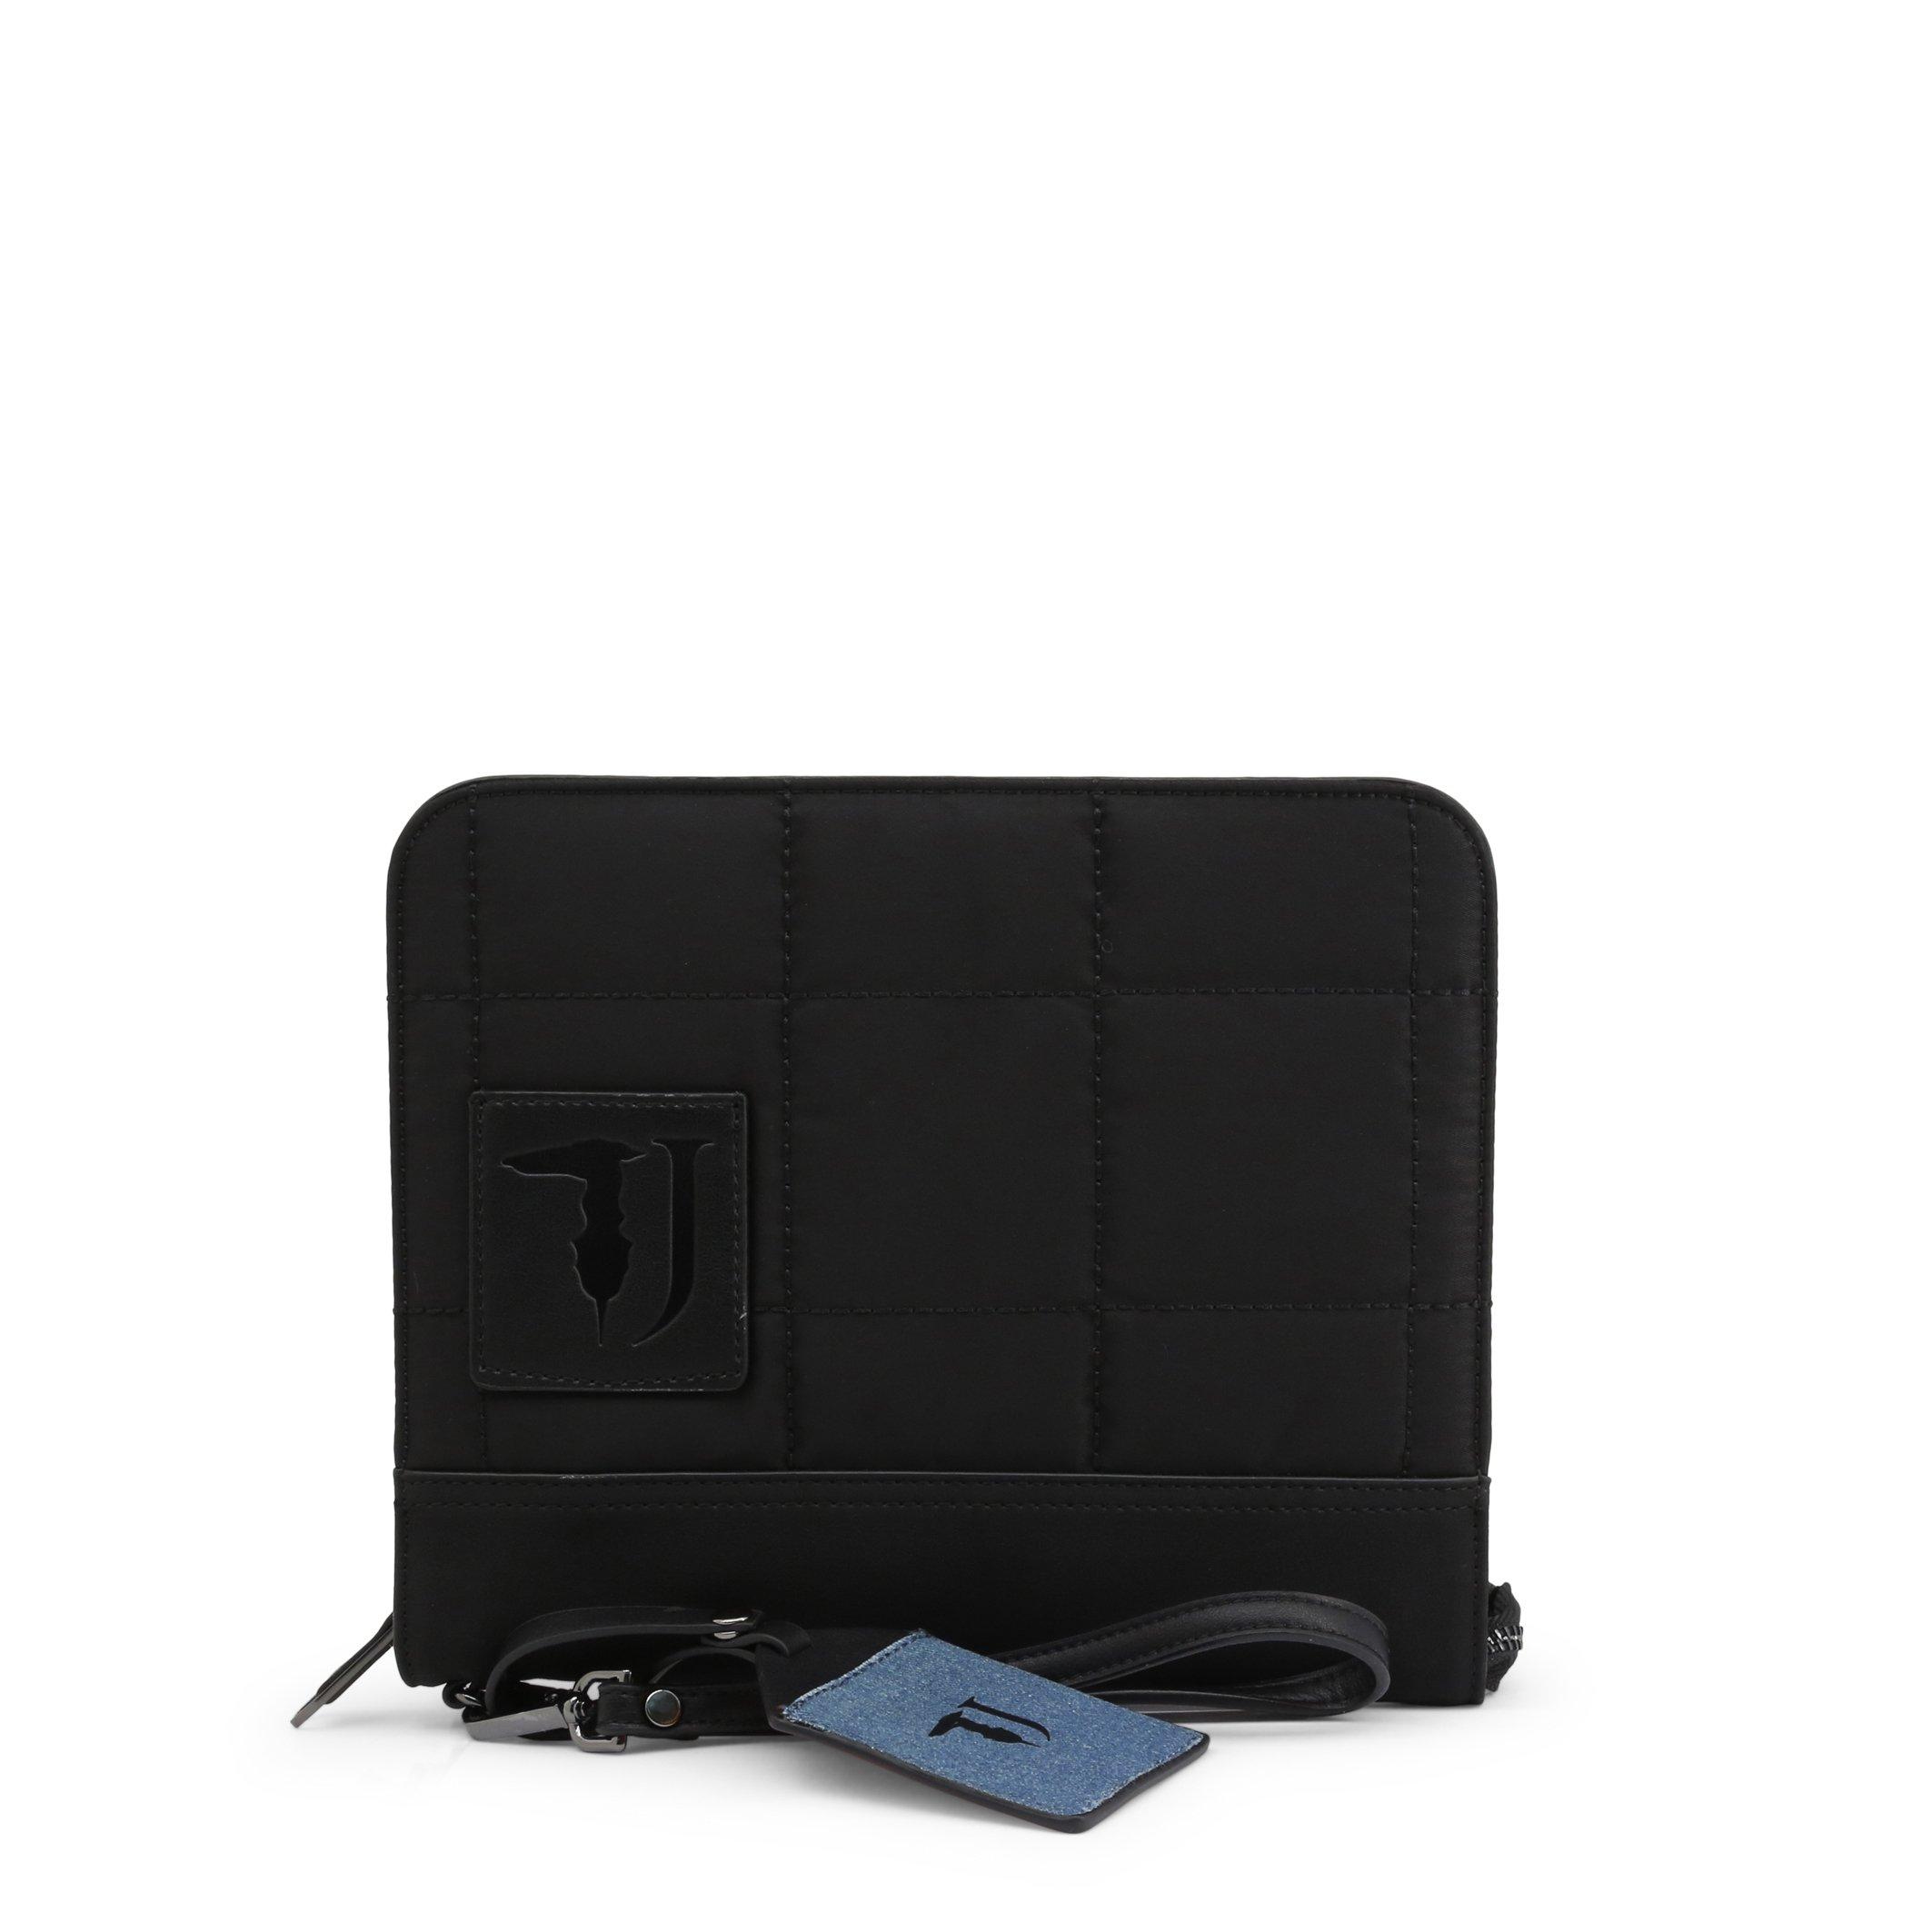 Trussardi Women's Handbag Various Colours TICINESE_71B00105-99 - black NOSIZE